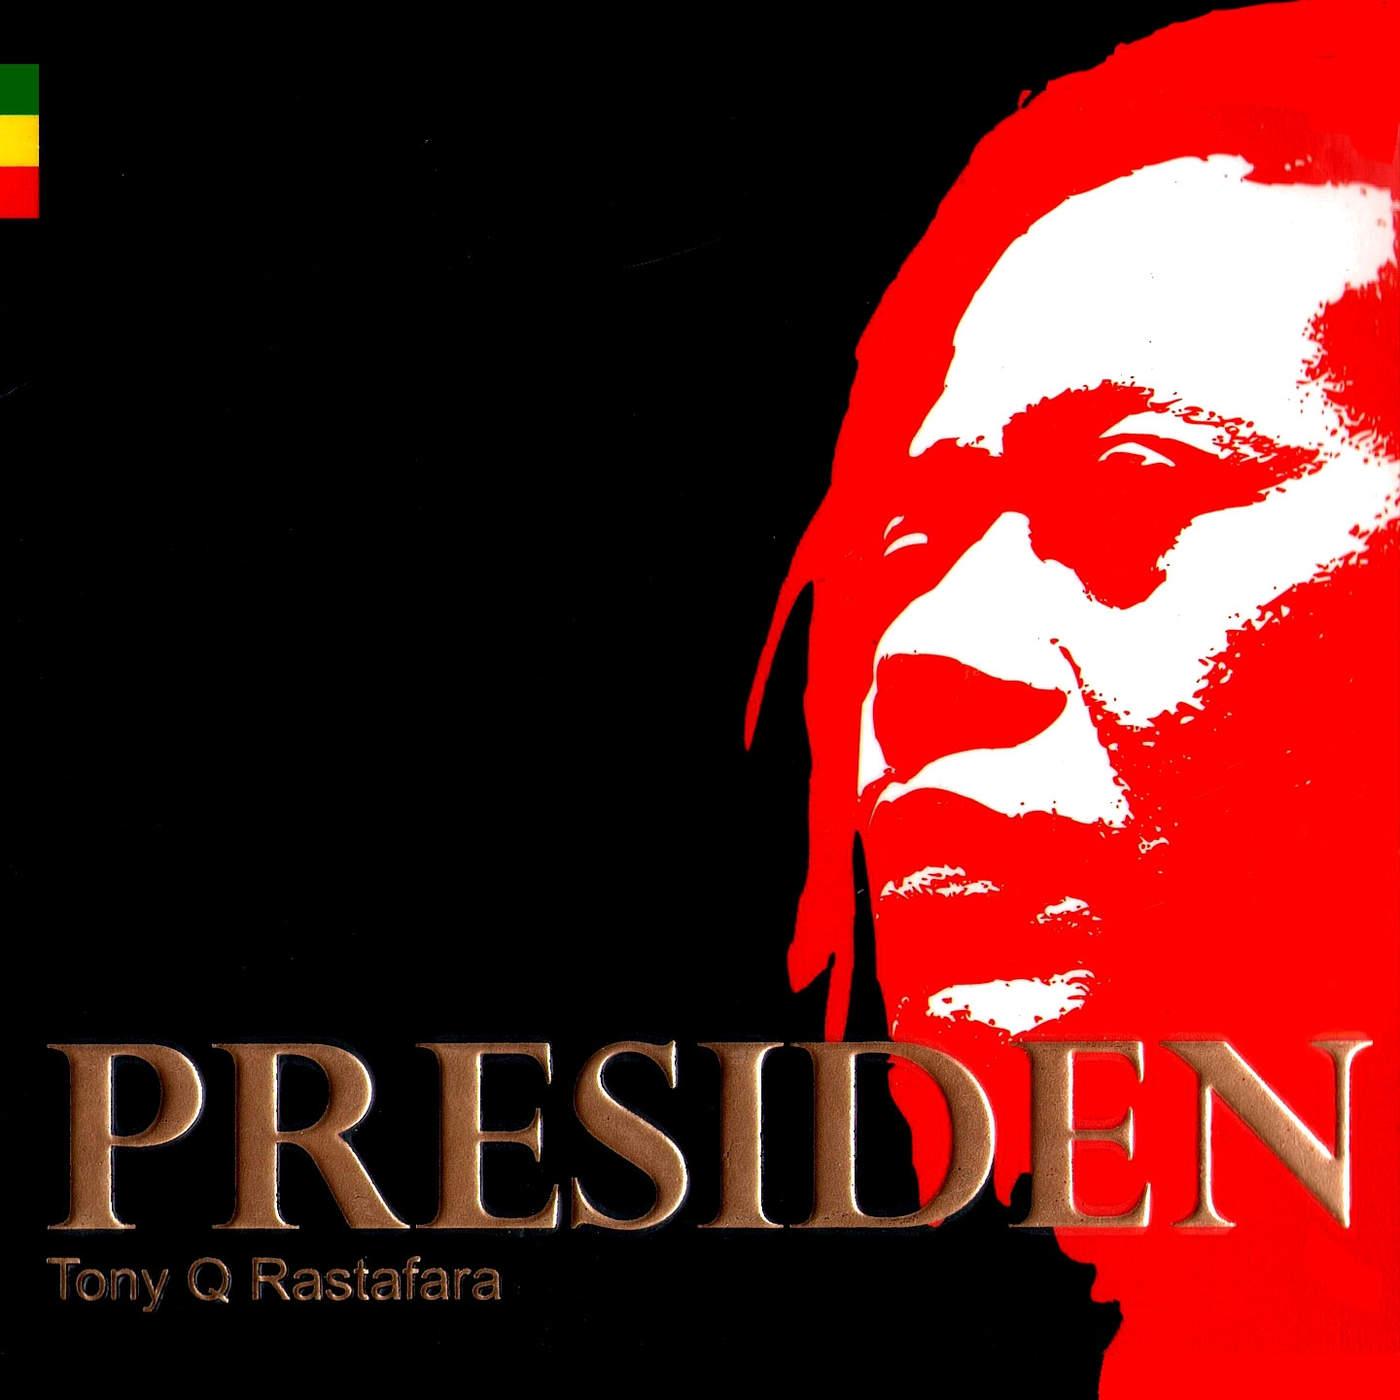 Tony Q Rastafara Presiden Itunes Purchased M4a